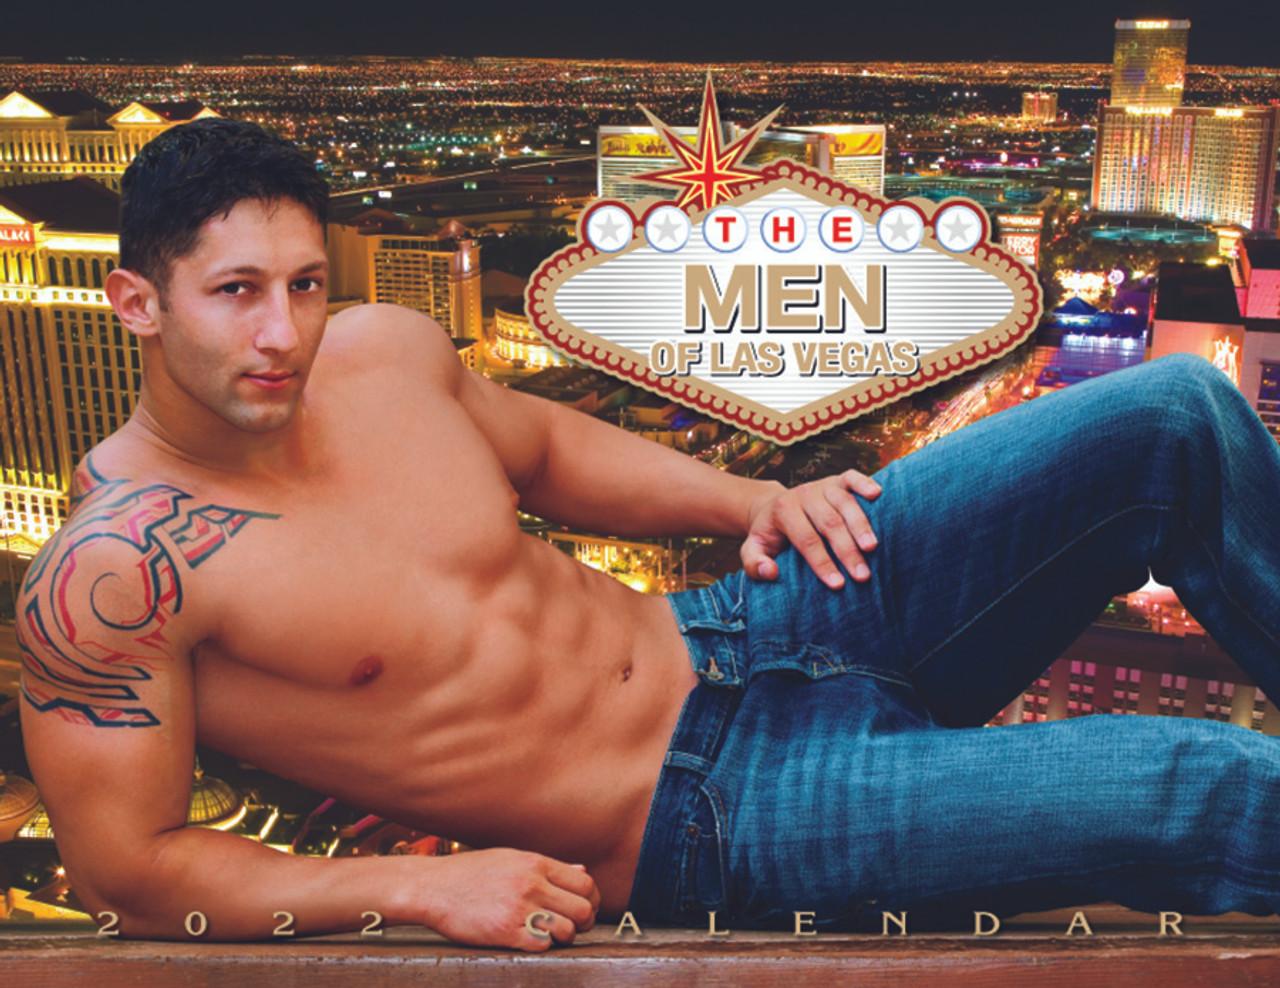 Las Vegas Calendar 2022.2022 Las Vegas Men Calendar